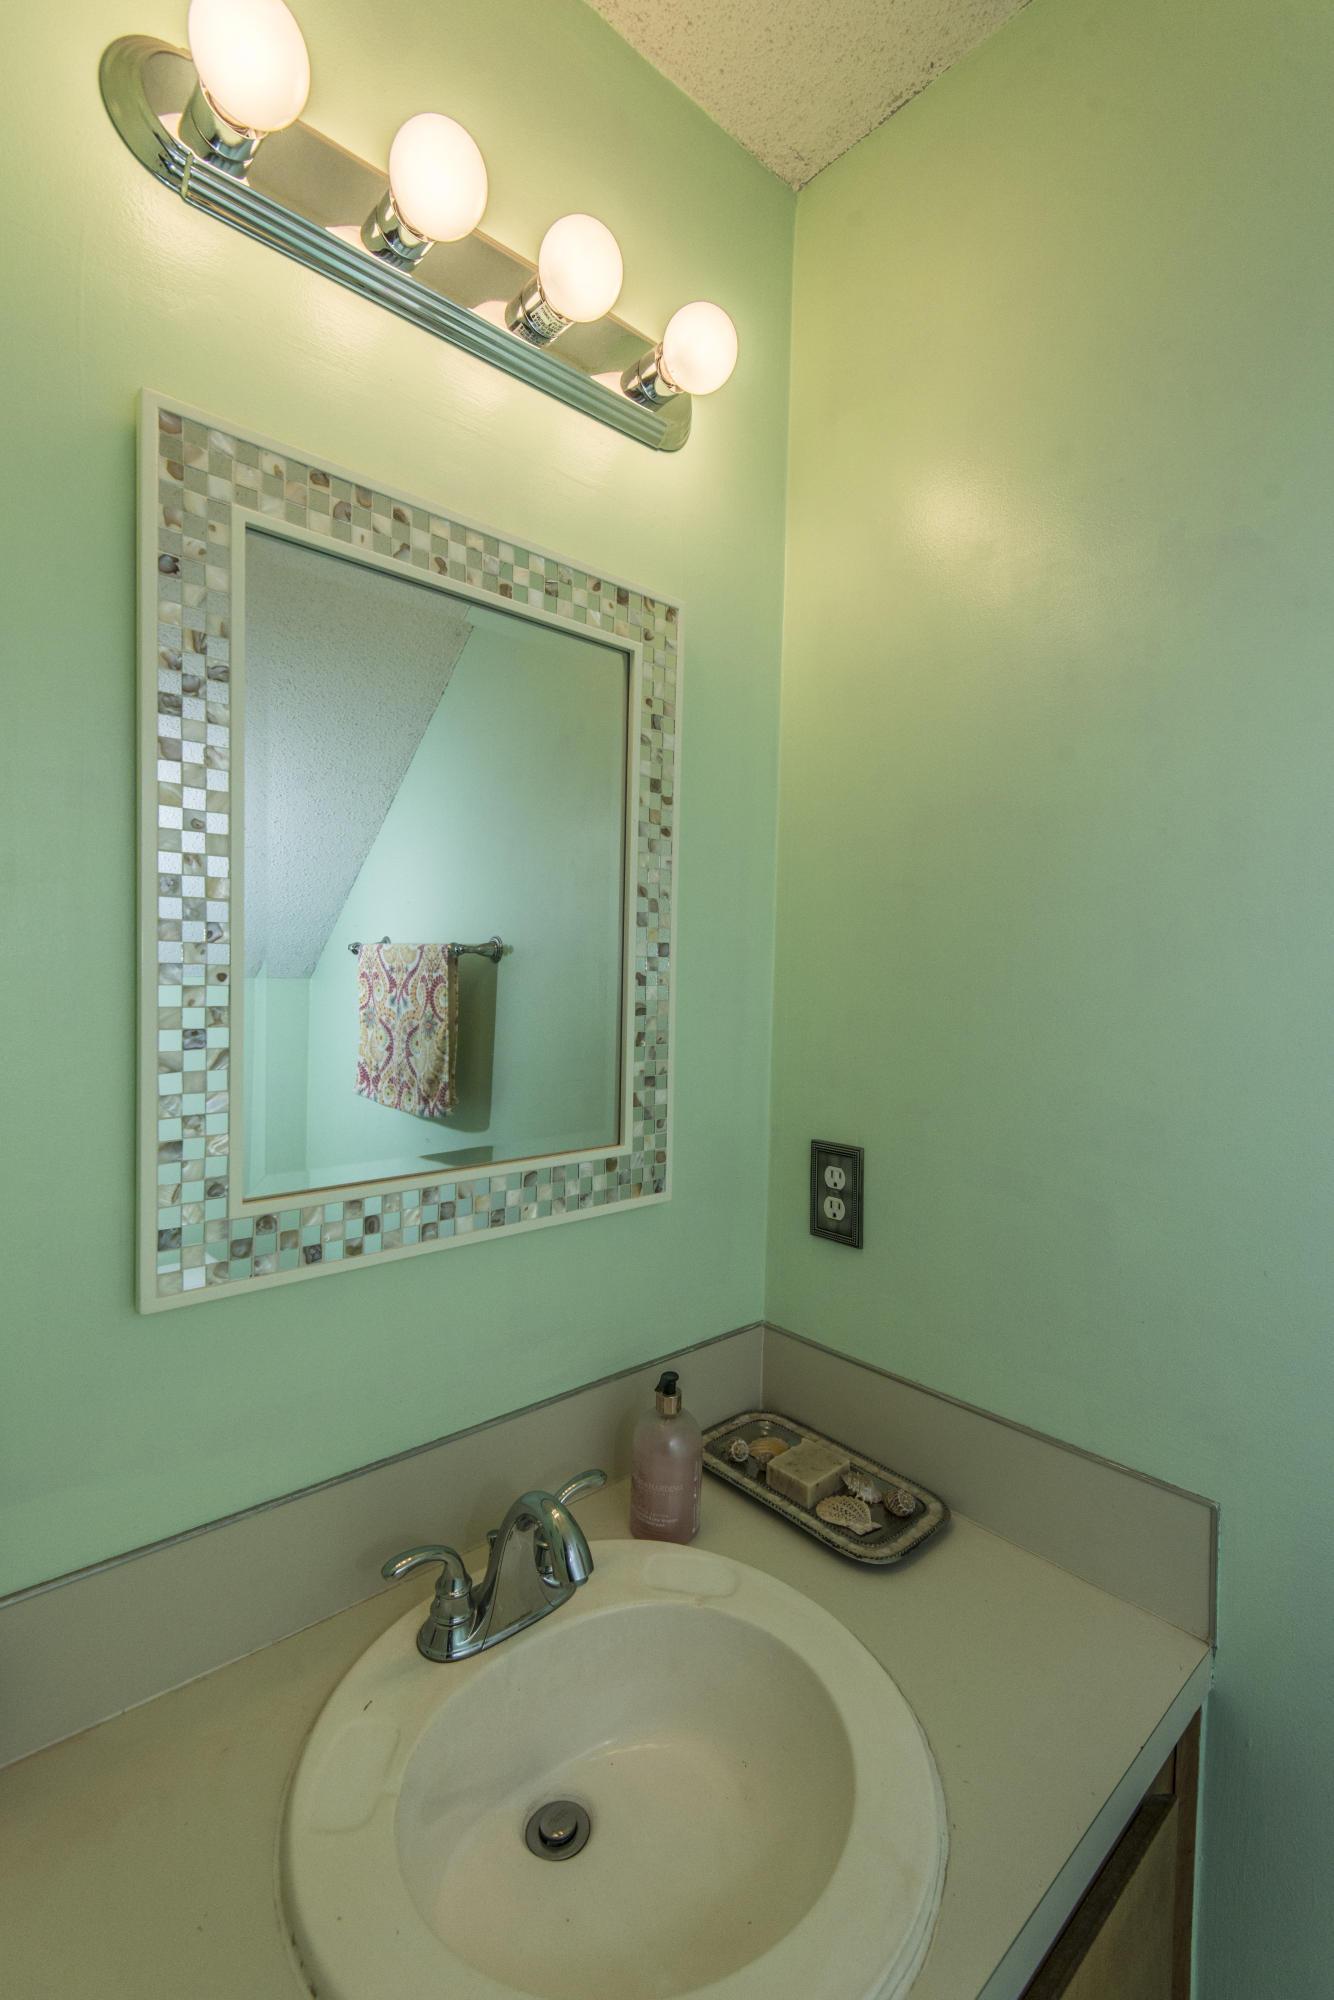 Bel Air Homes For Sale - 1508 Theresa, Charleston, SC - 10